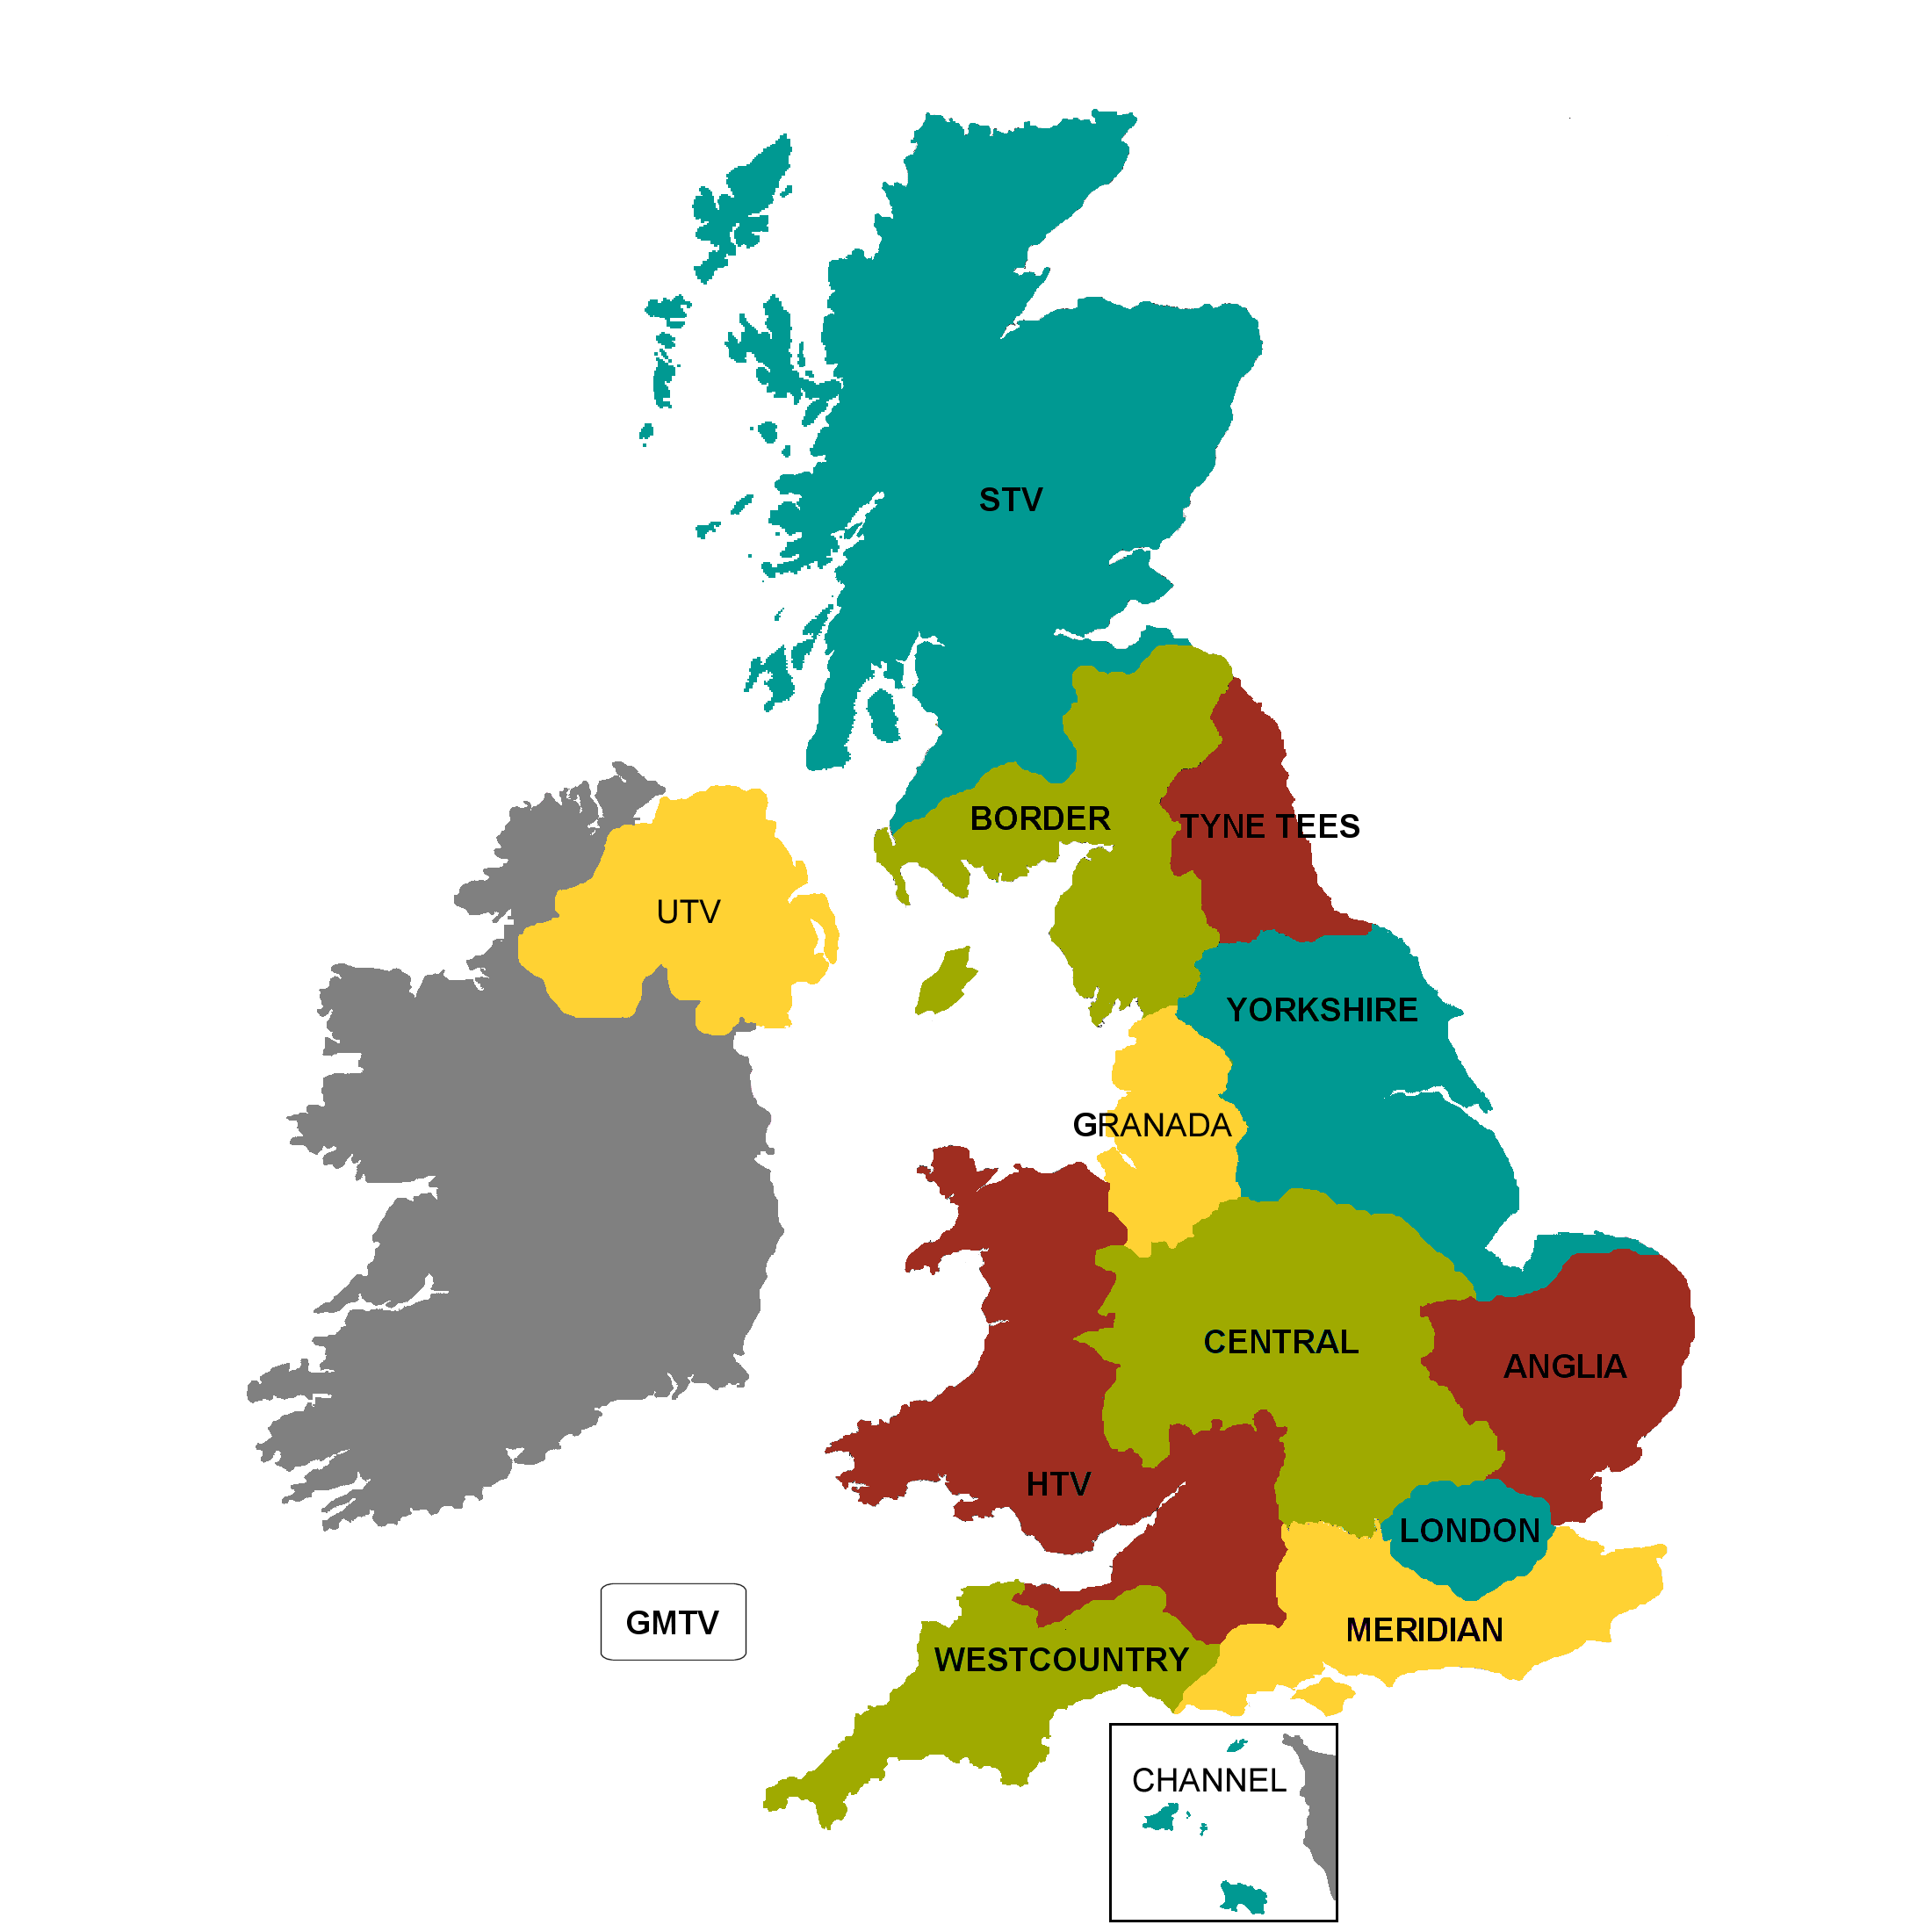 Itv Regions Map File:ITV regions map2.png   Wikimedia Commons Itv Regions Map